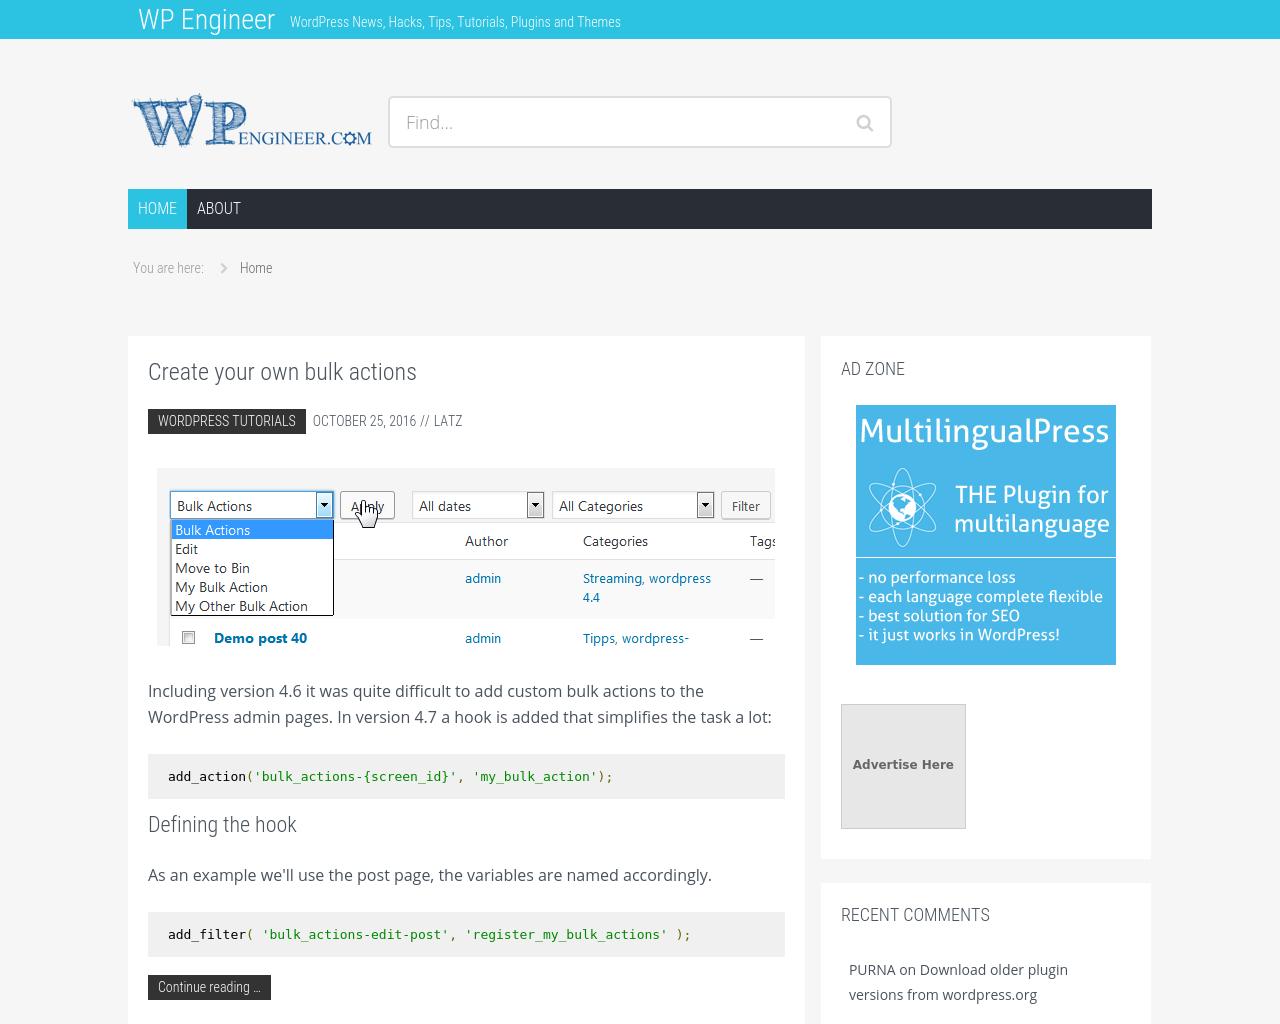 Wpengineer.com-Advertising-Reviews-Pricing